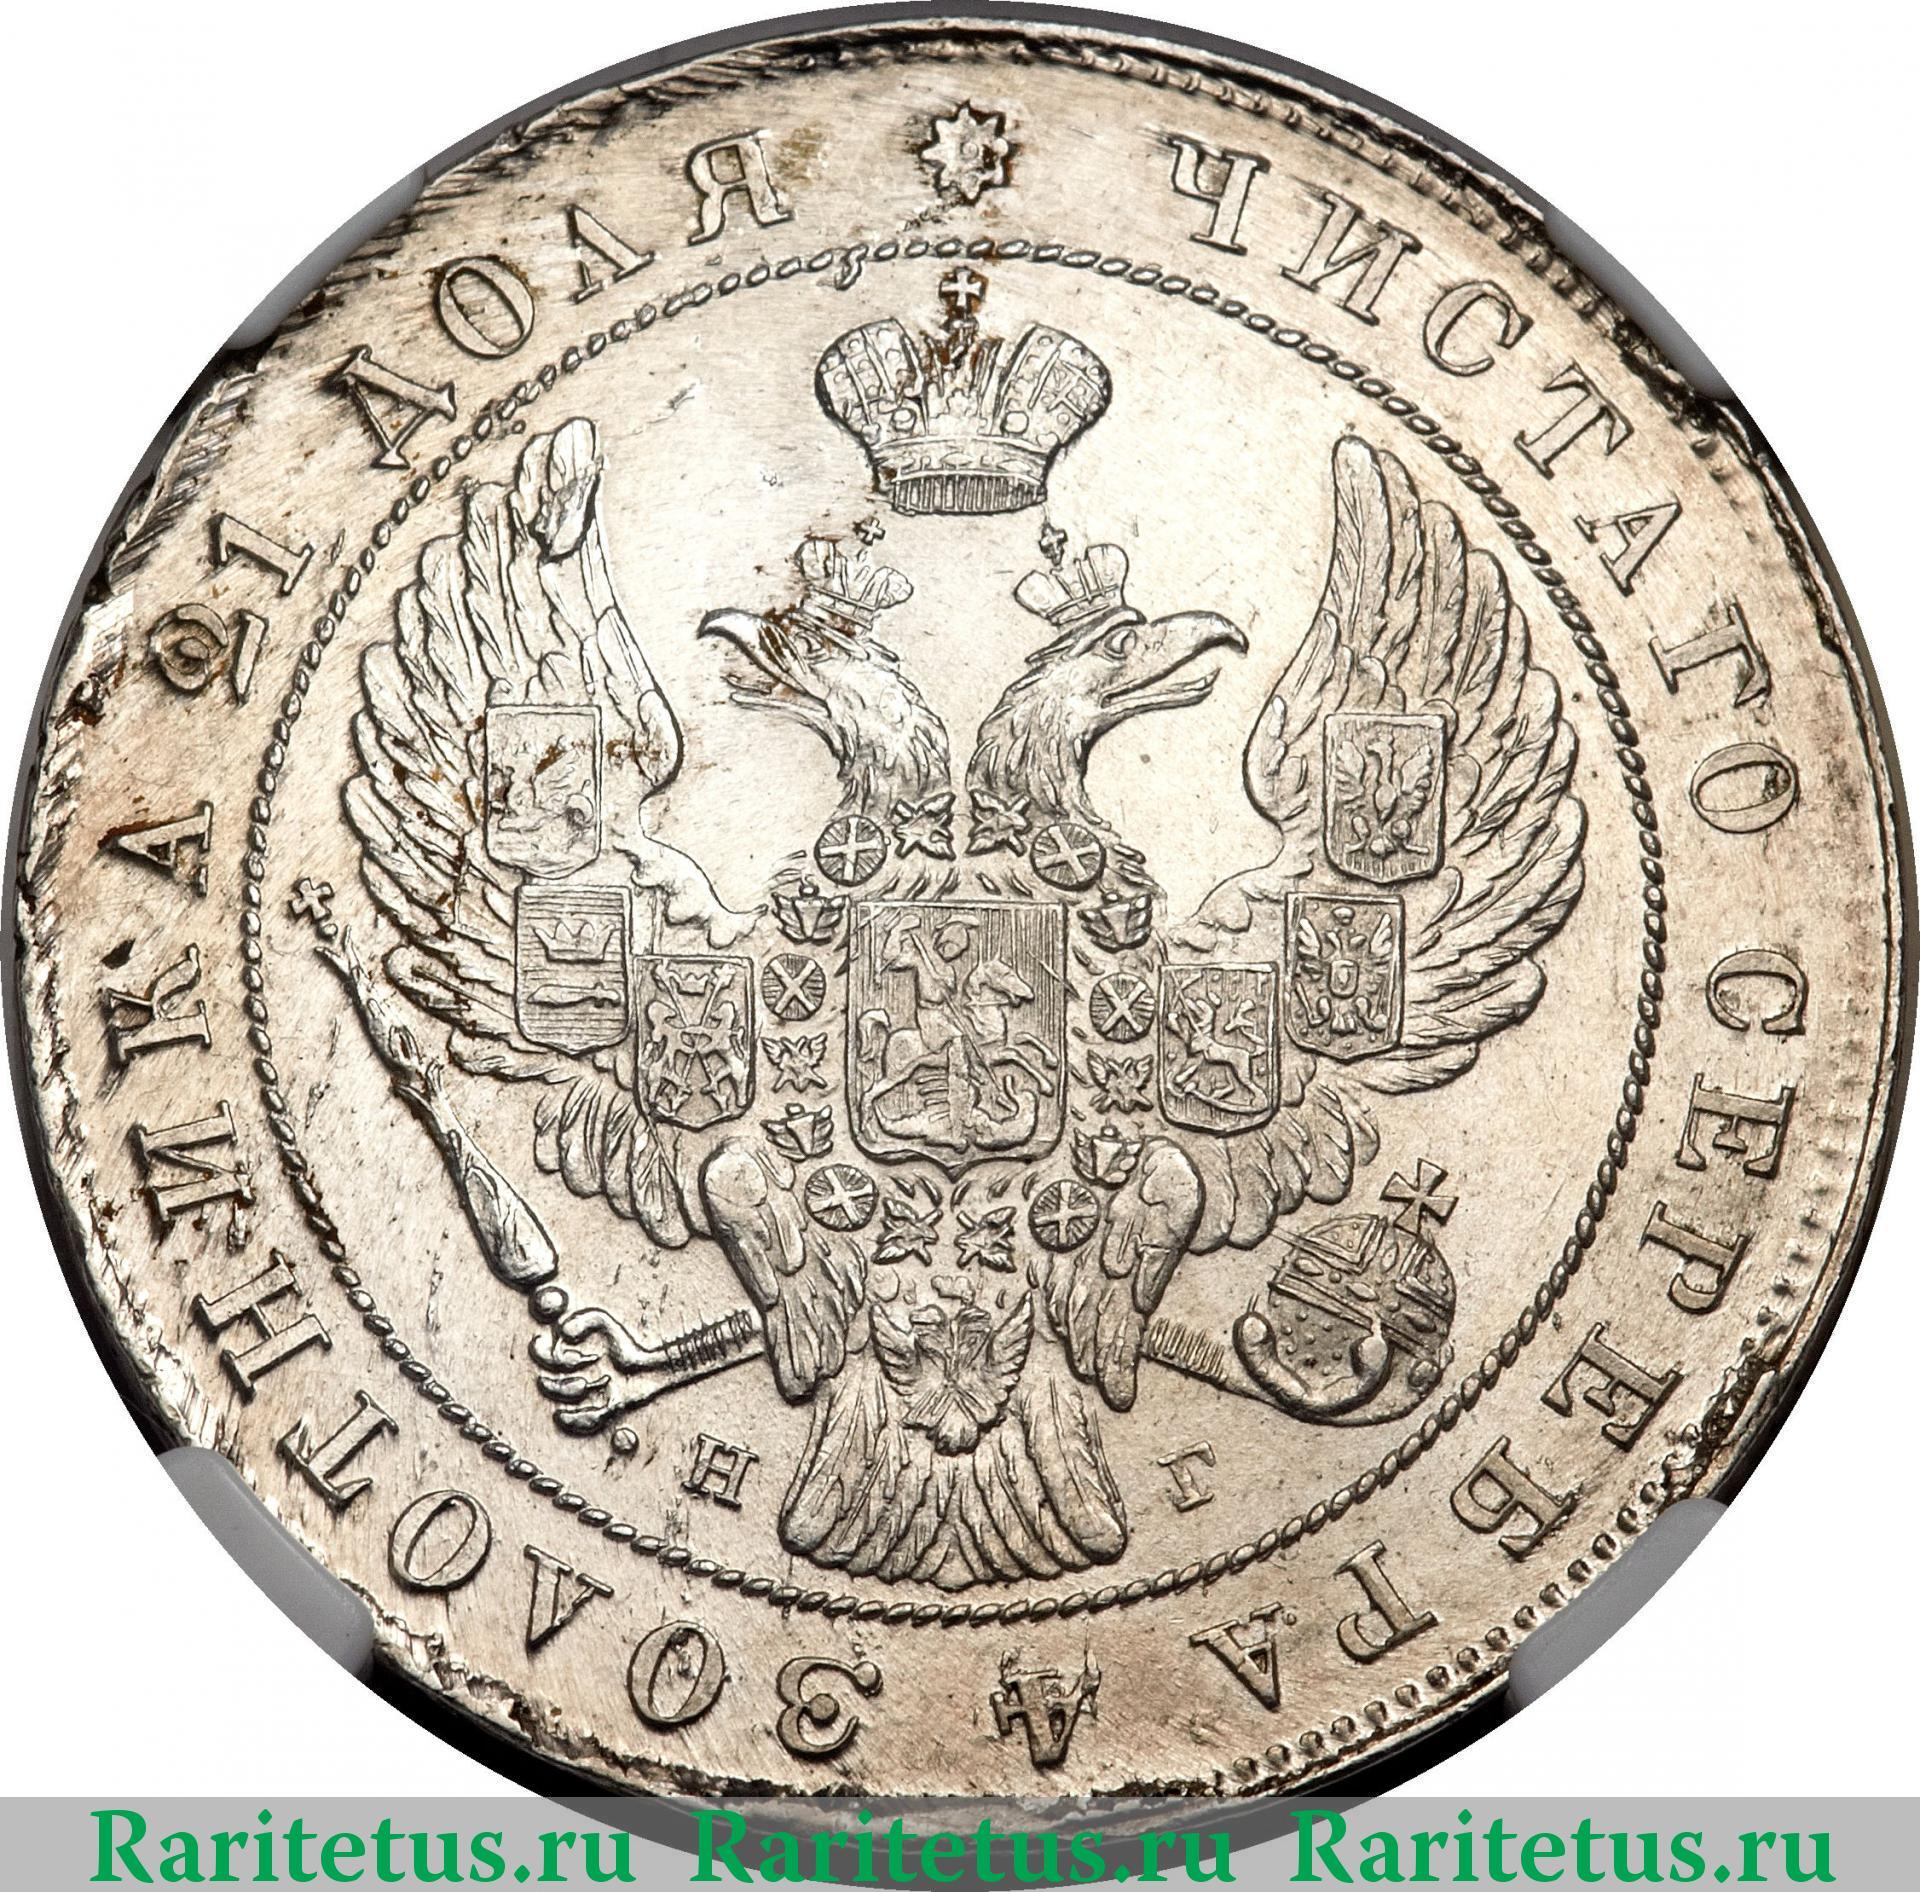 Аверс монеты 1 рубль 1841 года СПБ-НГ